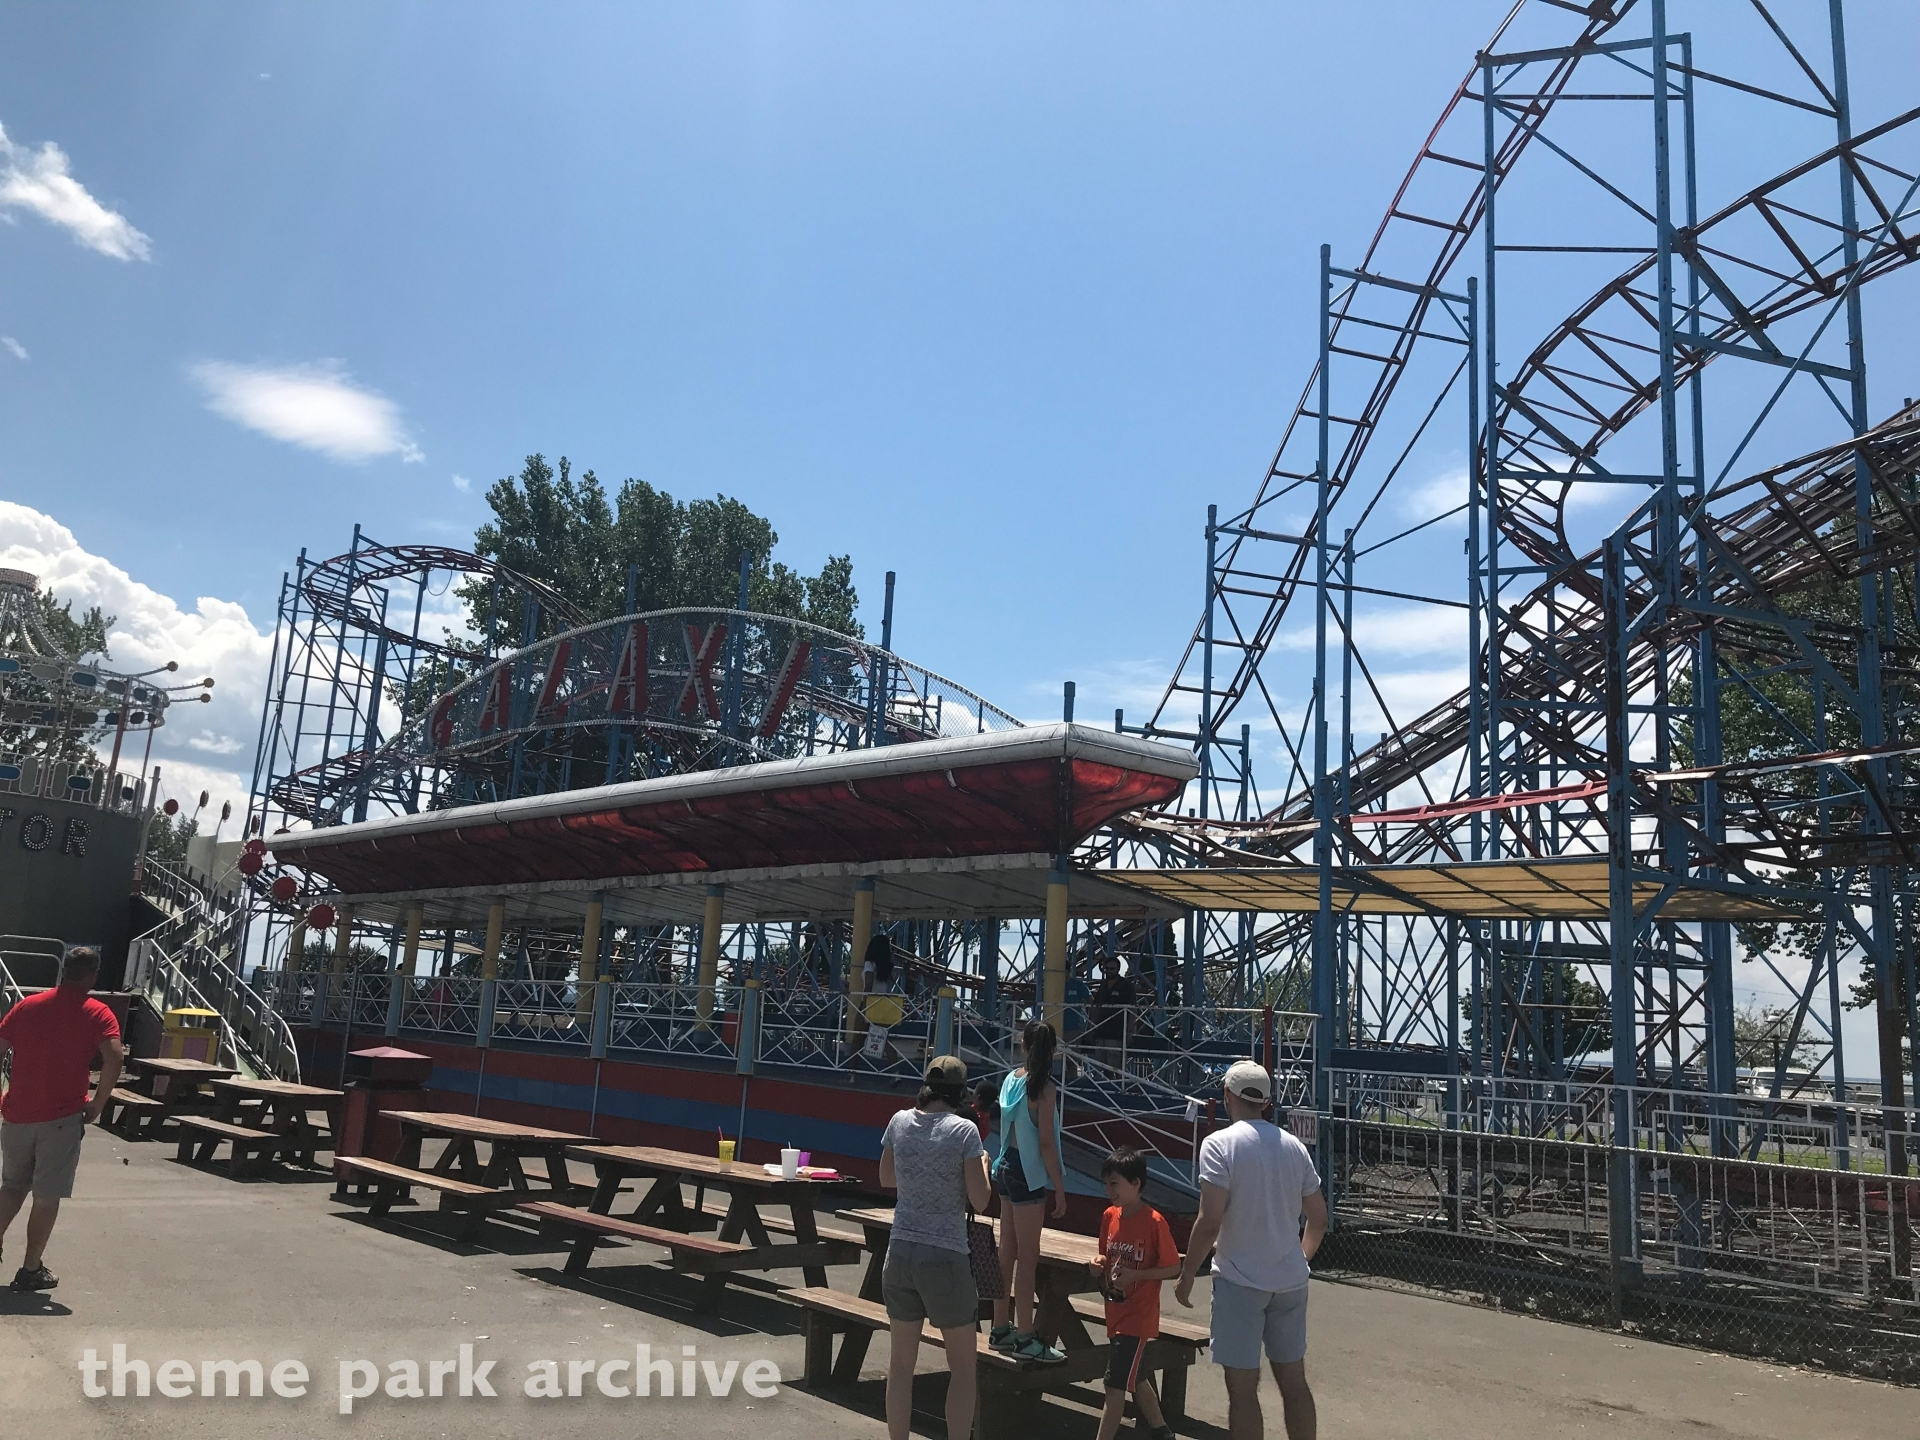 galaxi coaster sylvan beach amusement park